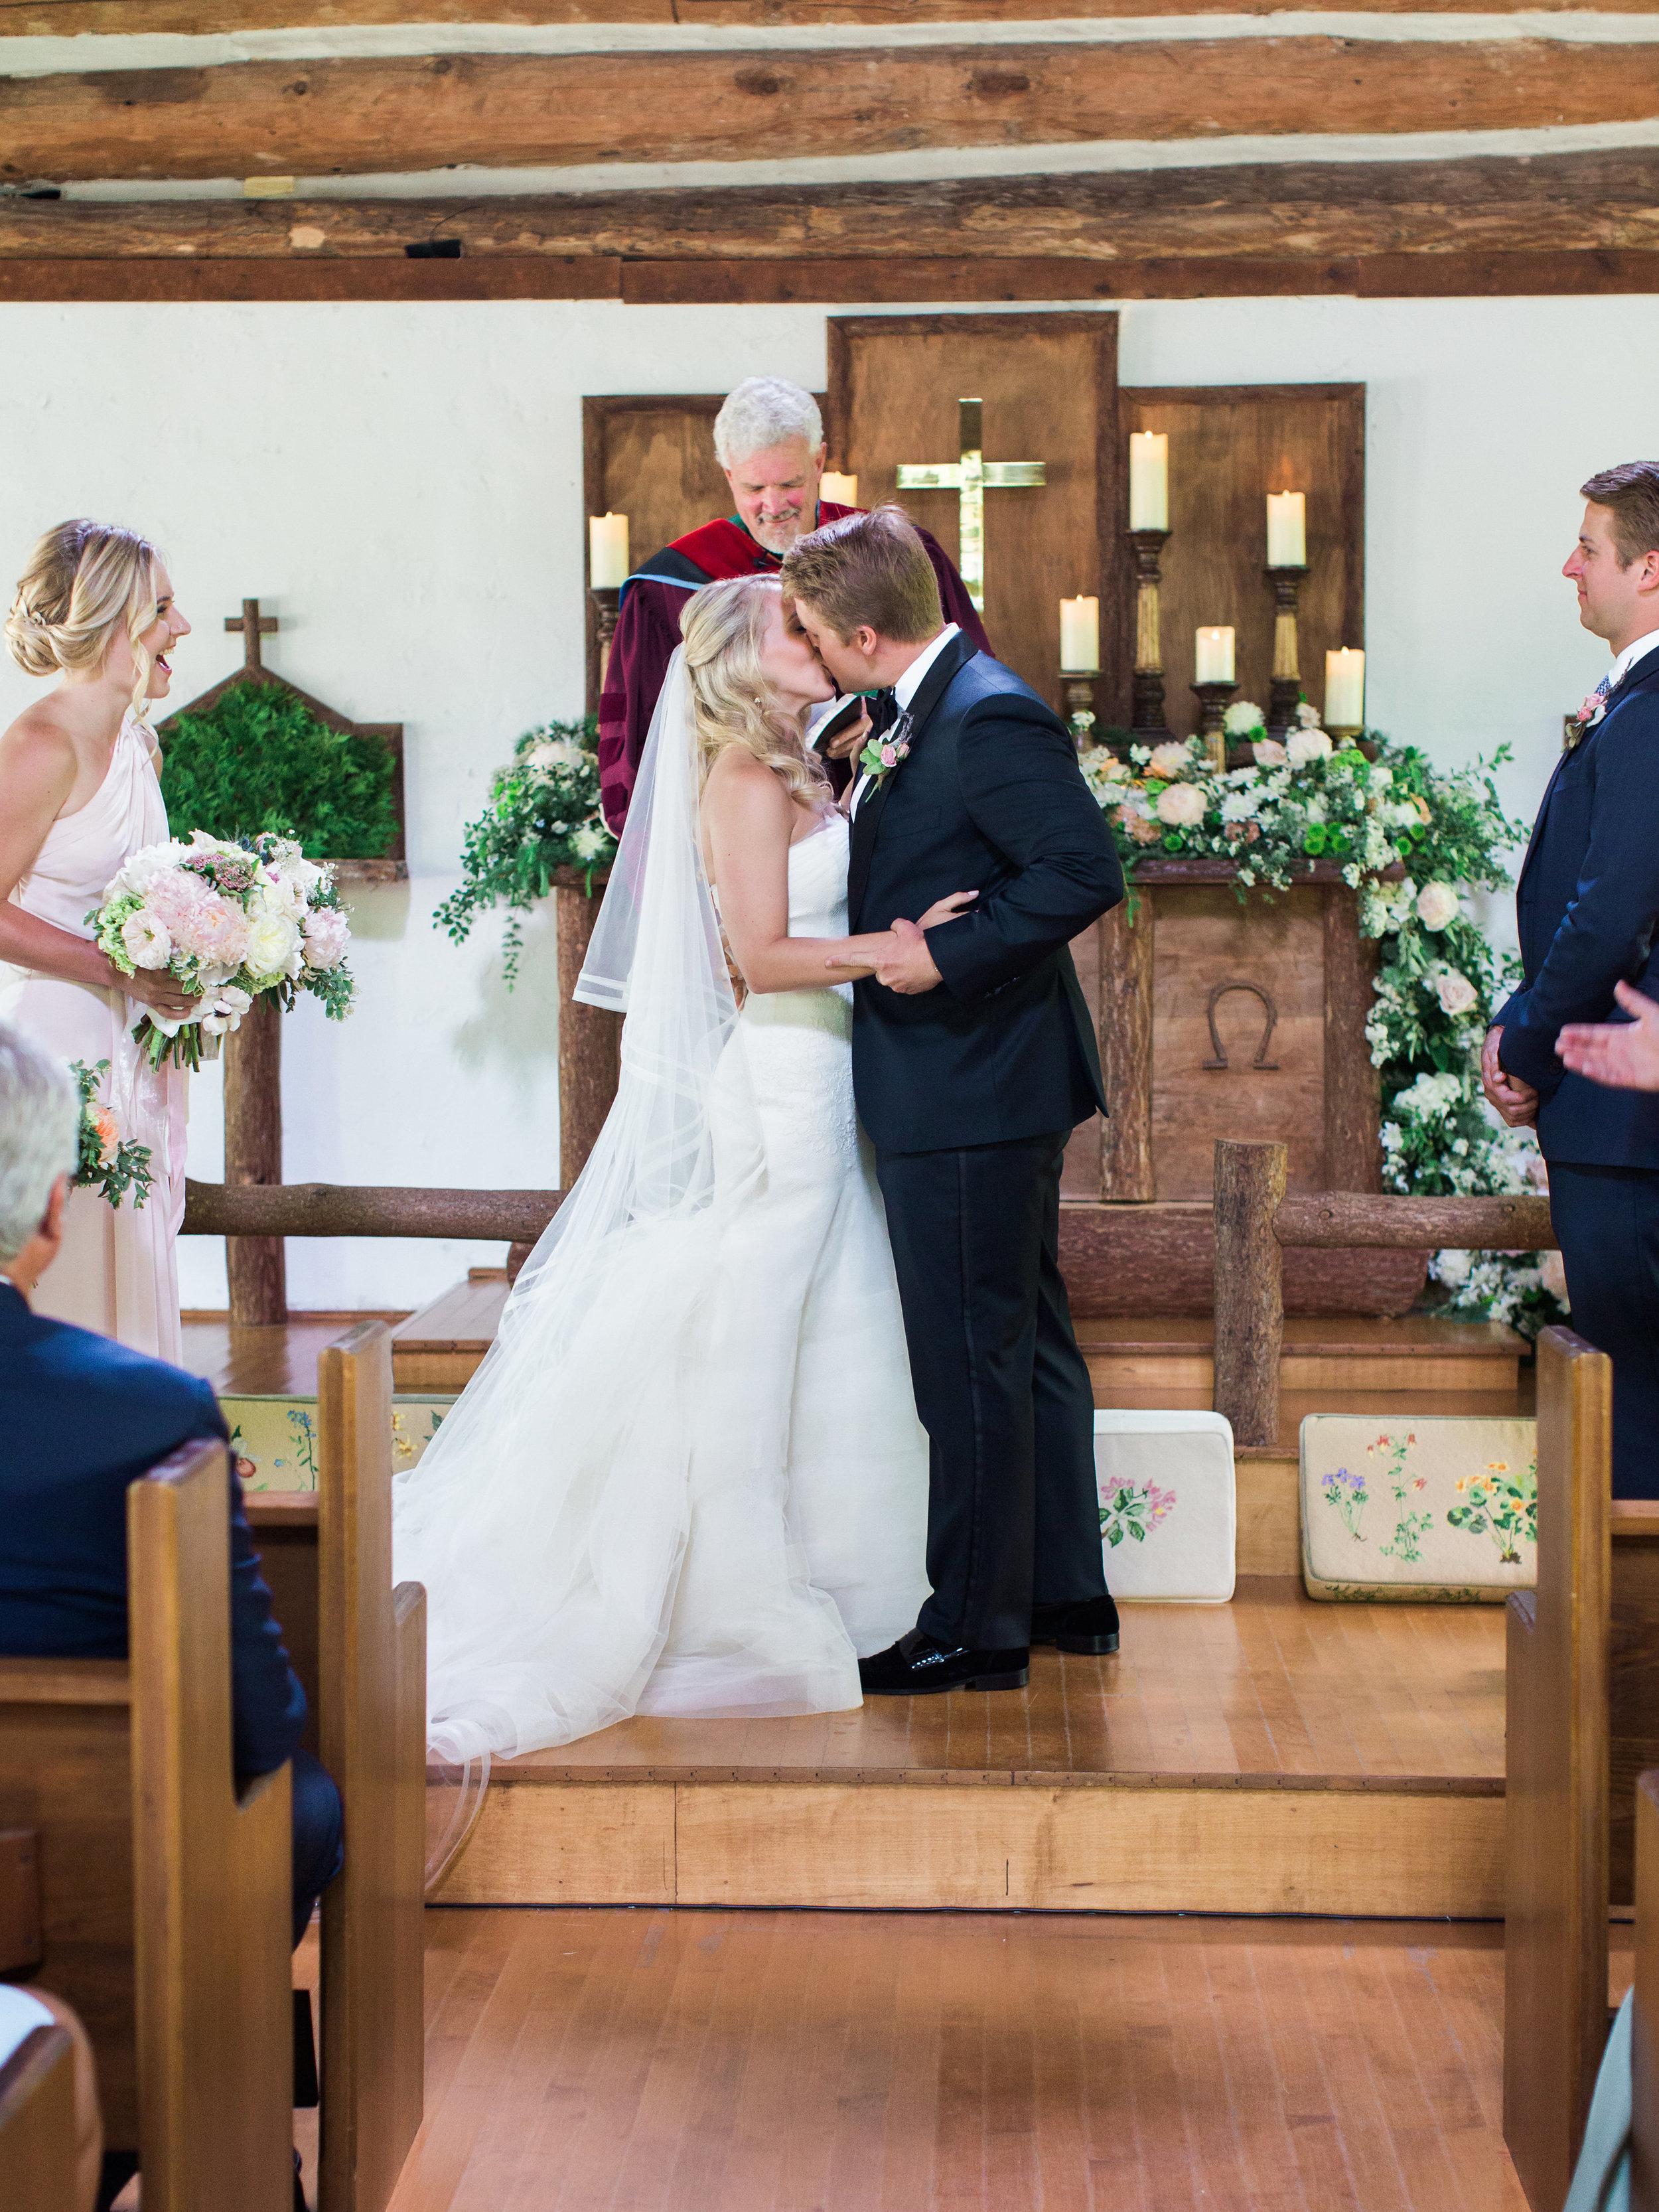 Coffman+Wedding+Ceremony-105.jpg